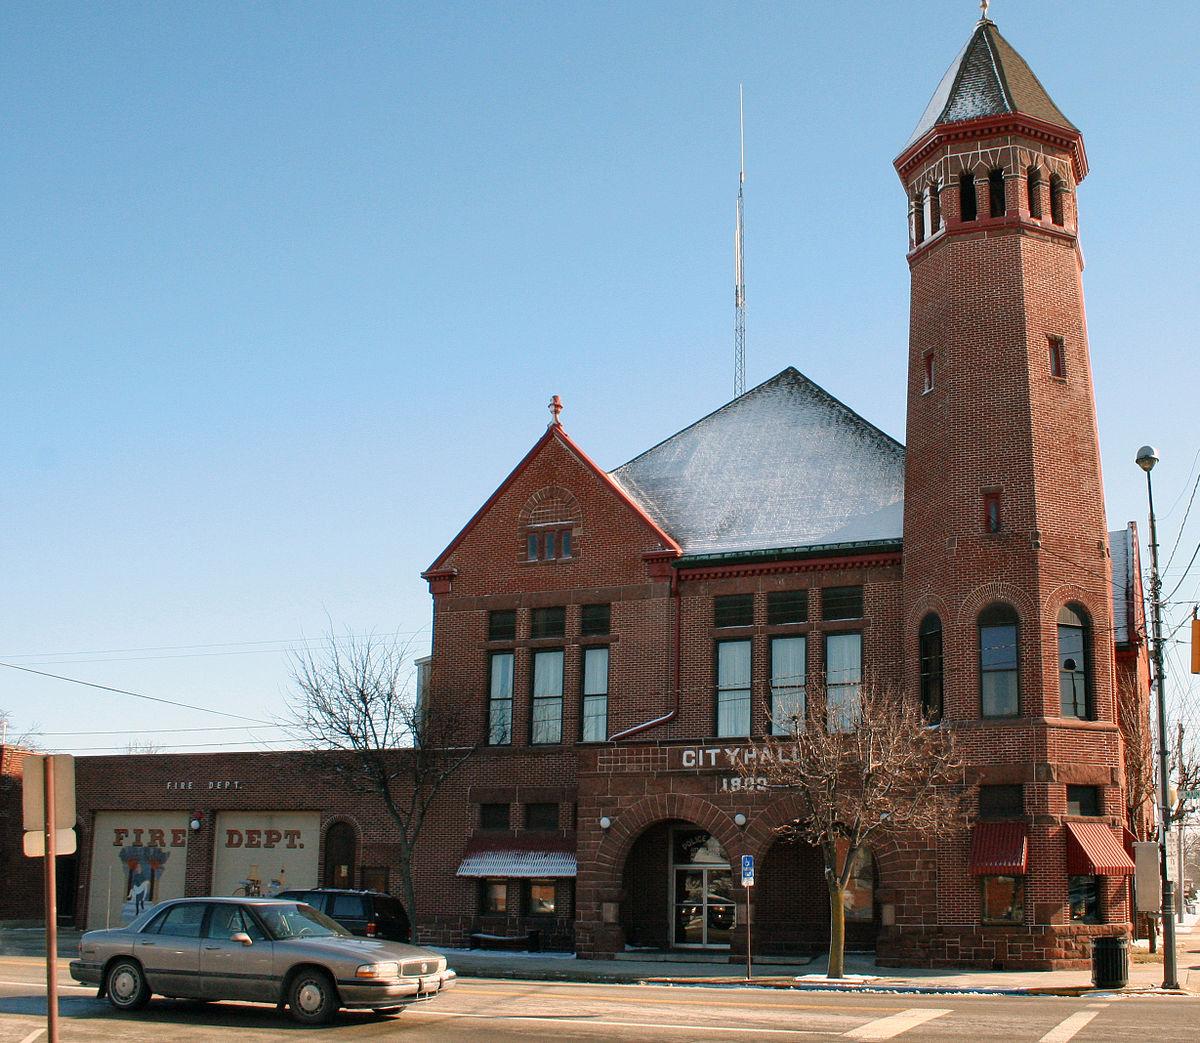 Ohio mercer county rockford - Ohio Mercer County Rockford 39